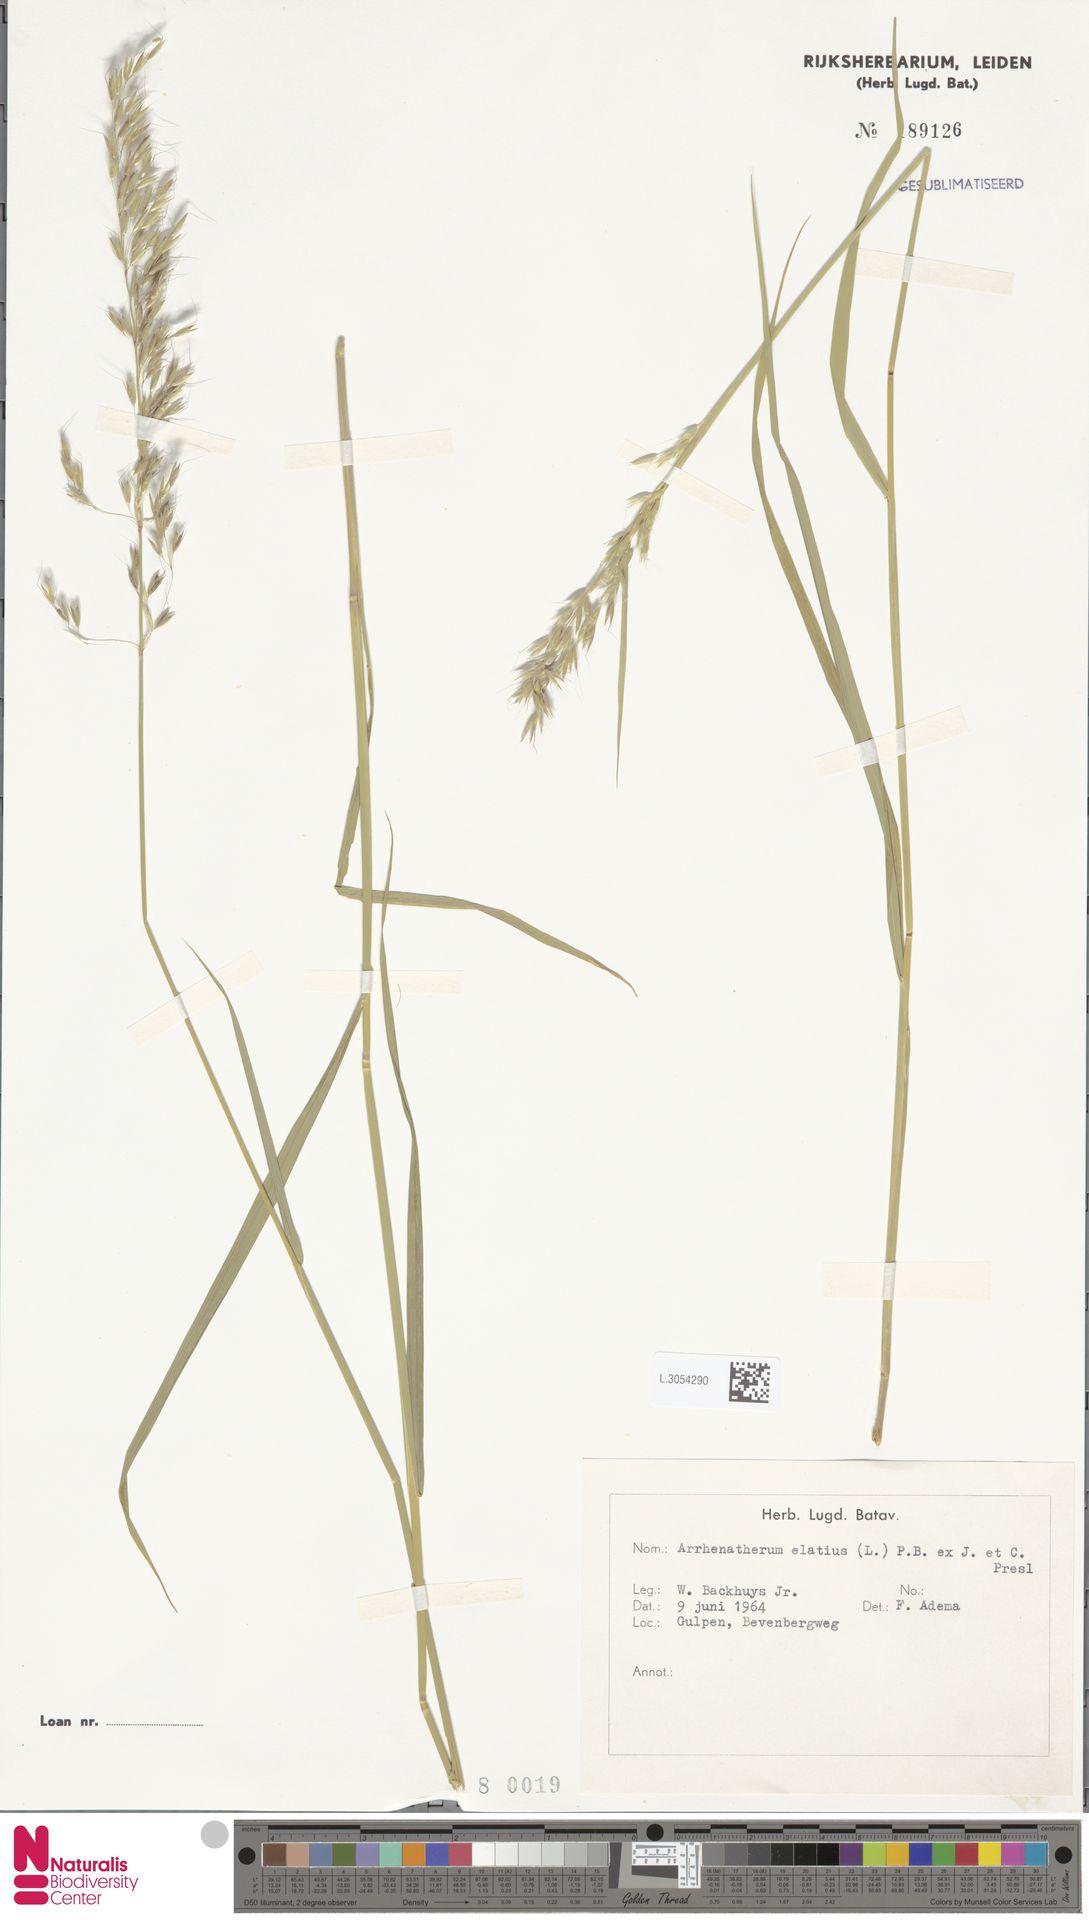 L.3054290 | Arrhenatherum elatius (L.) P.Beauv. ex J.Presl & C.Presl